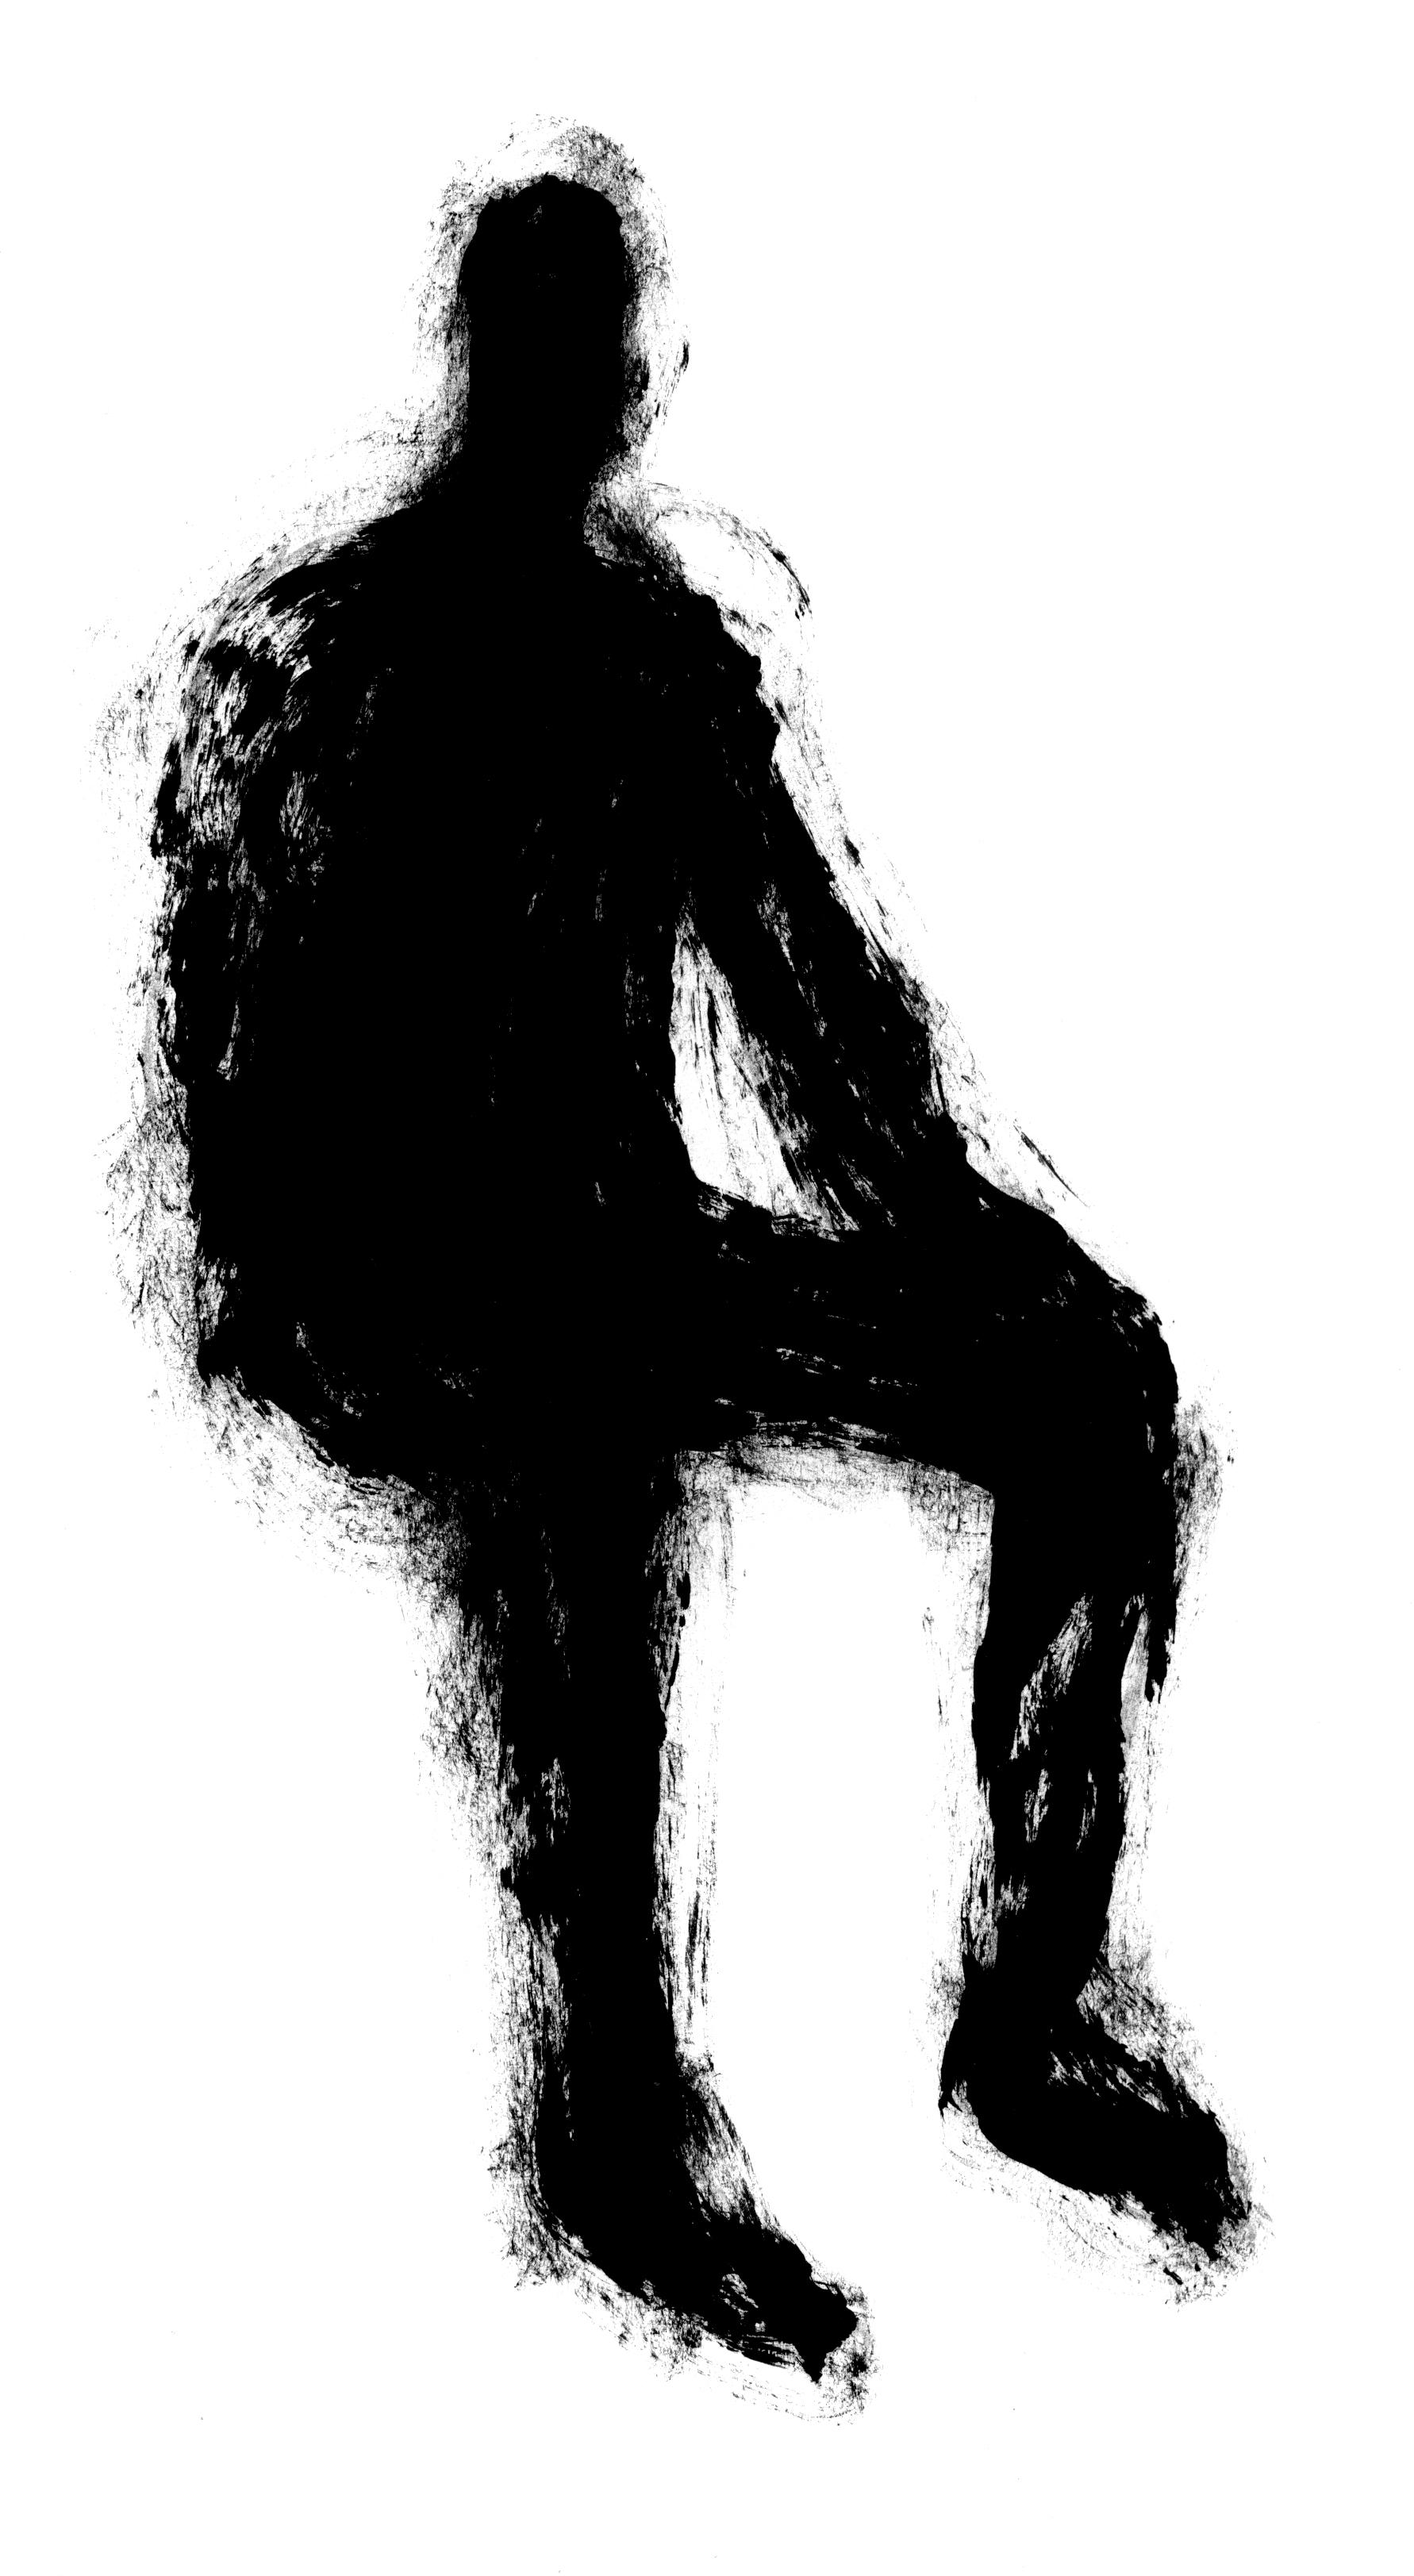 DavidLyonSeated Figure.jpg